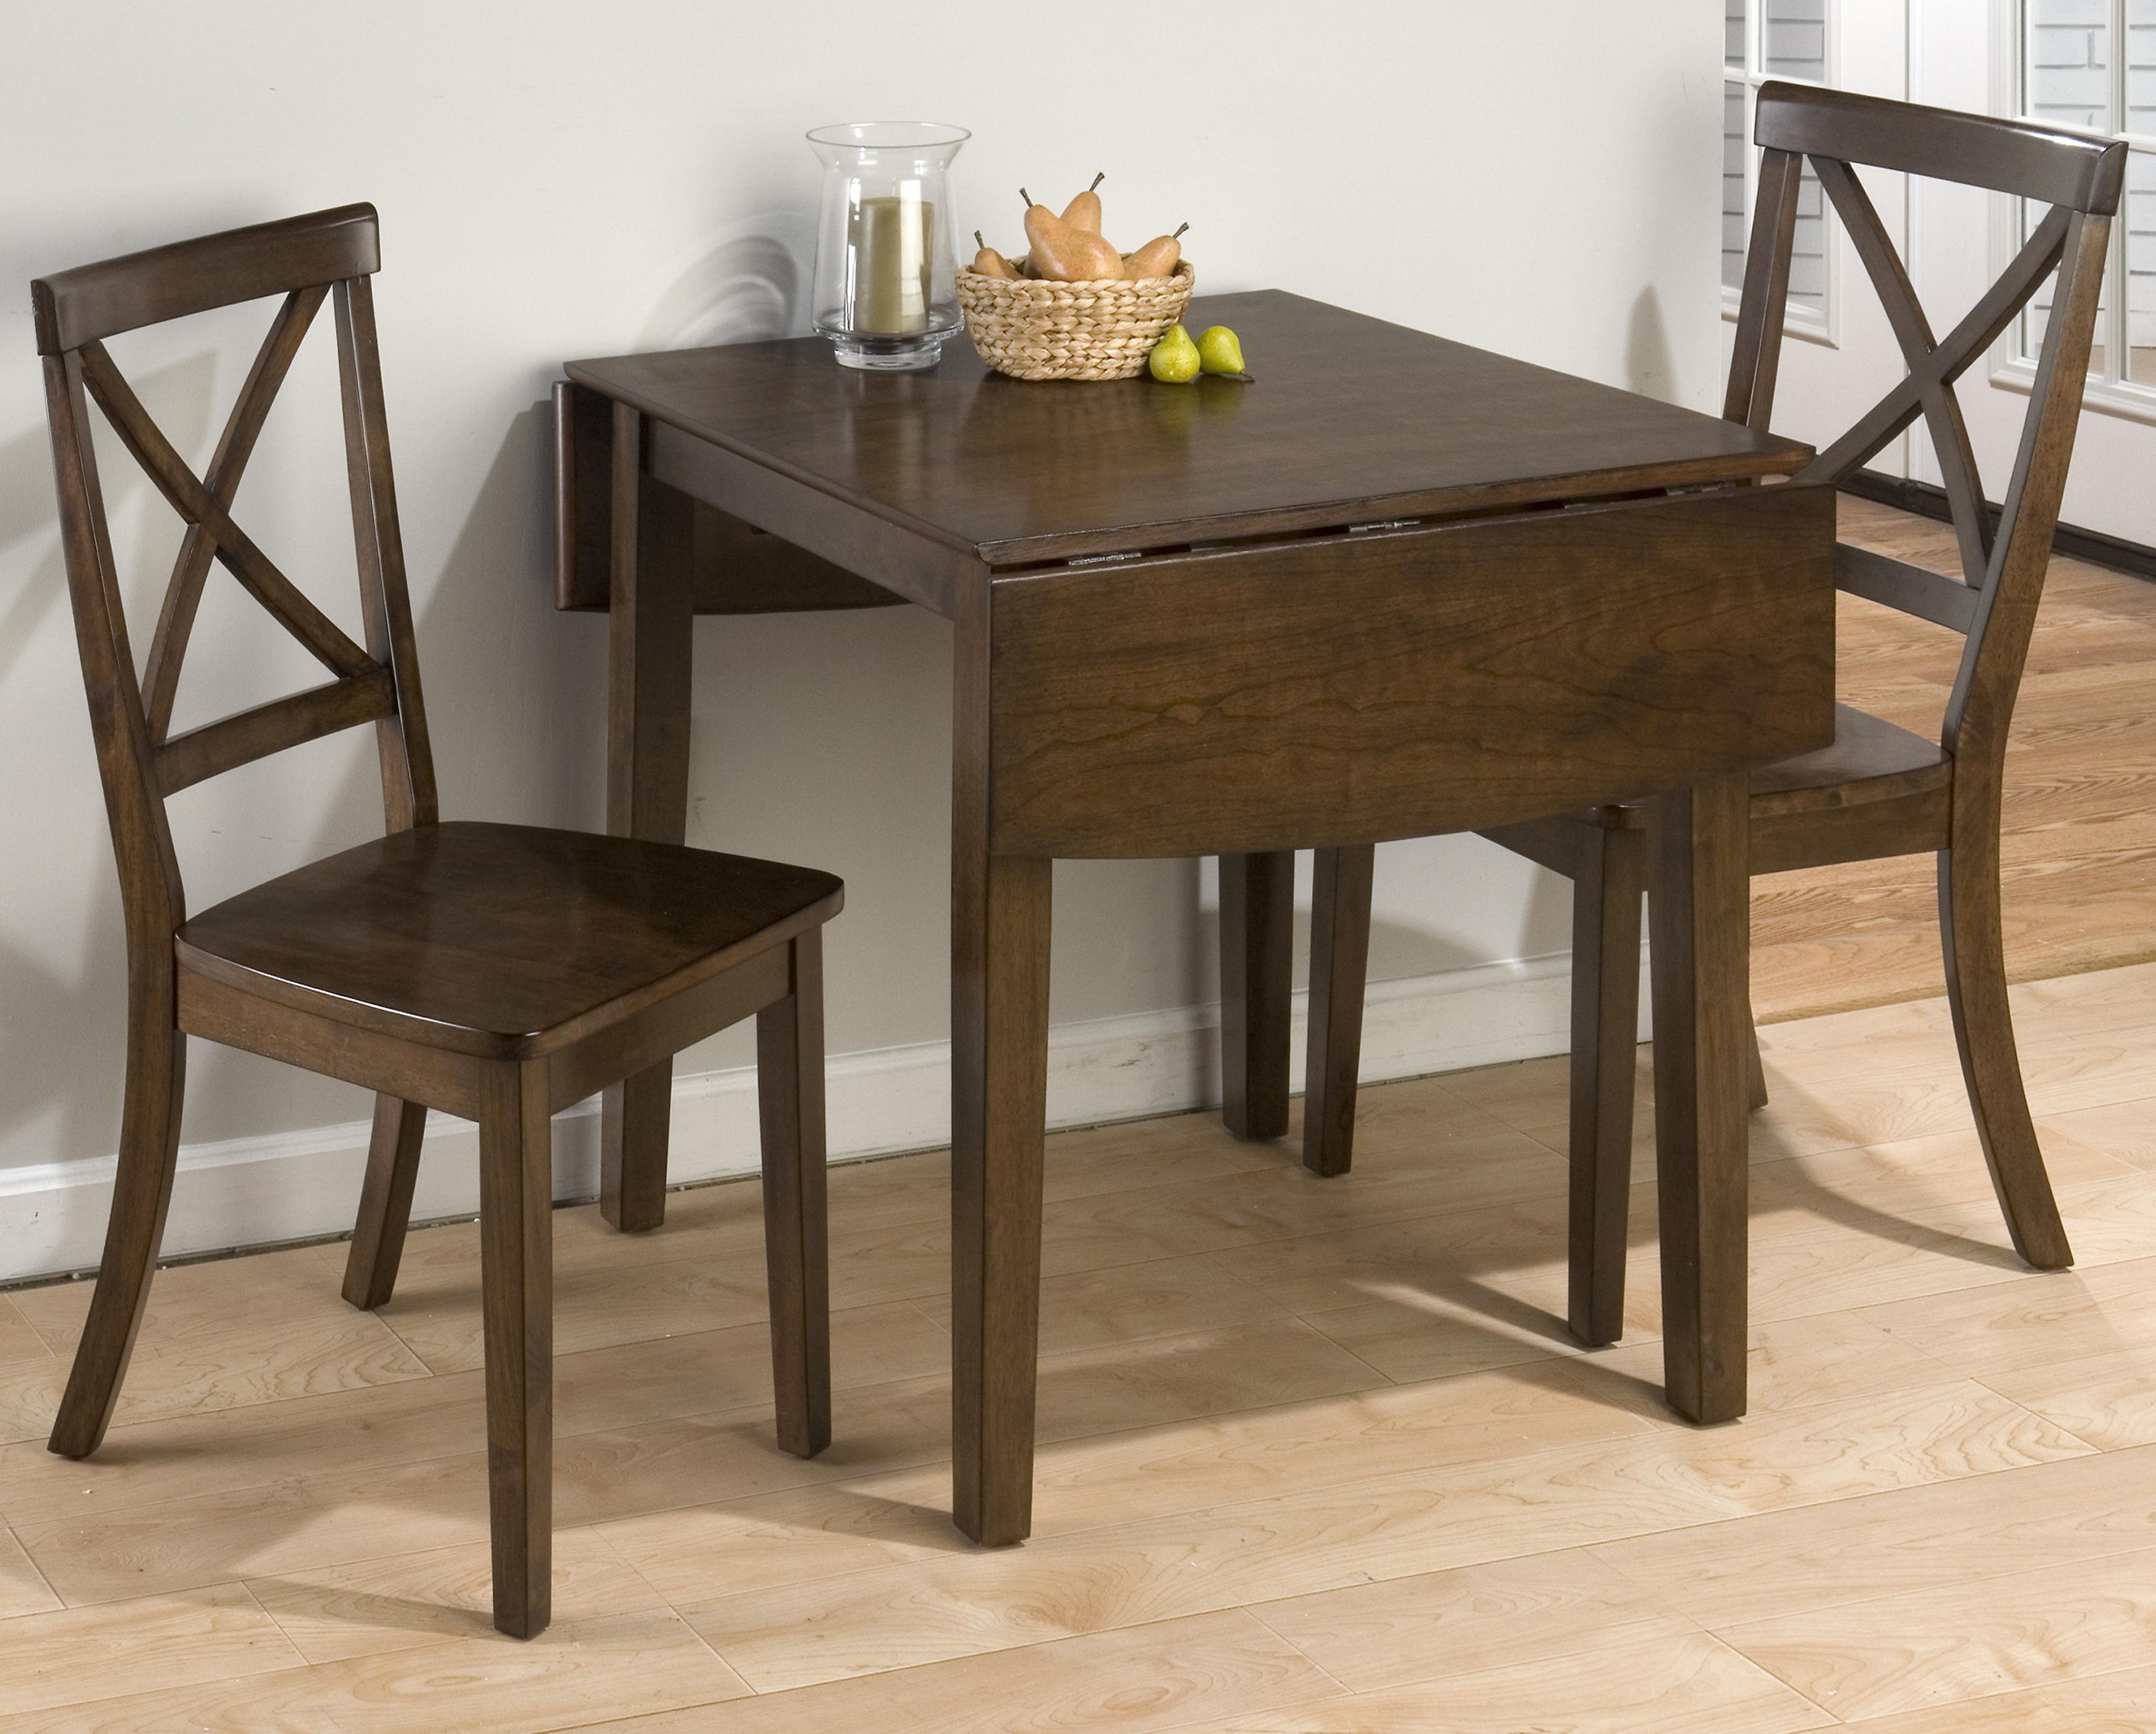 Taylor Cherry 3-Piece Dining Set by Jofran at A1 Furniture & Mattress